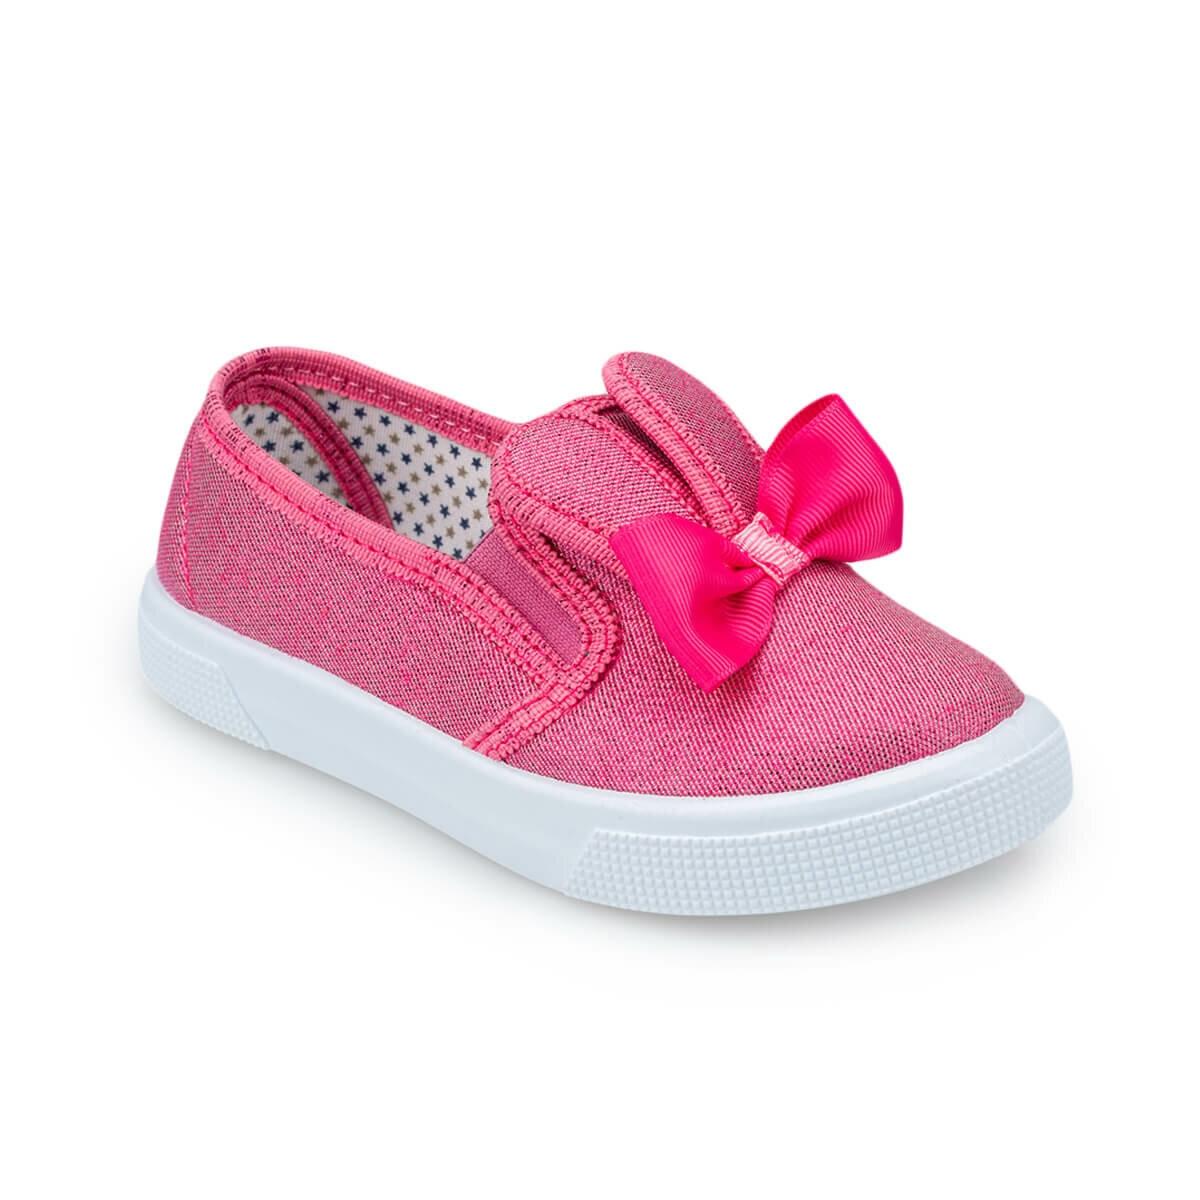 FLO 91.511436.P Pink Female Child Slip On Shoes Polaris